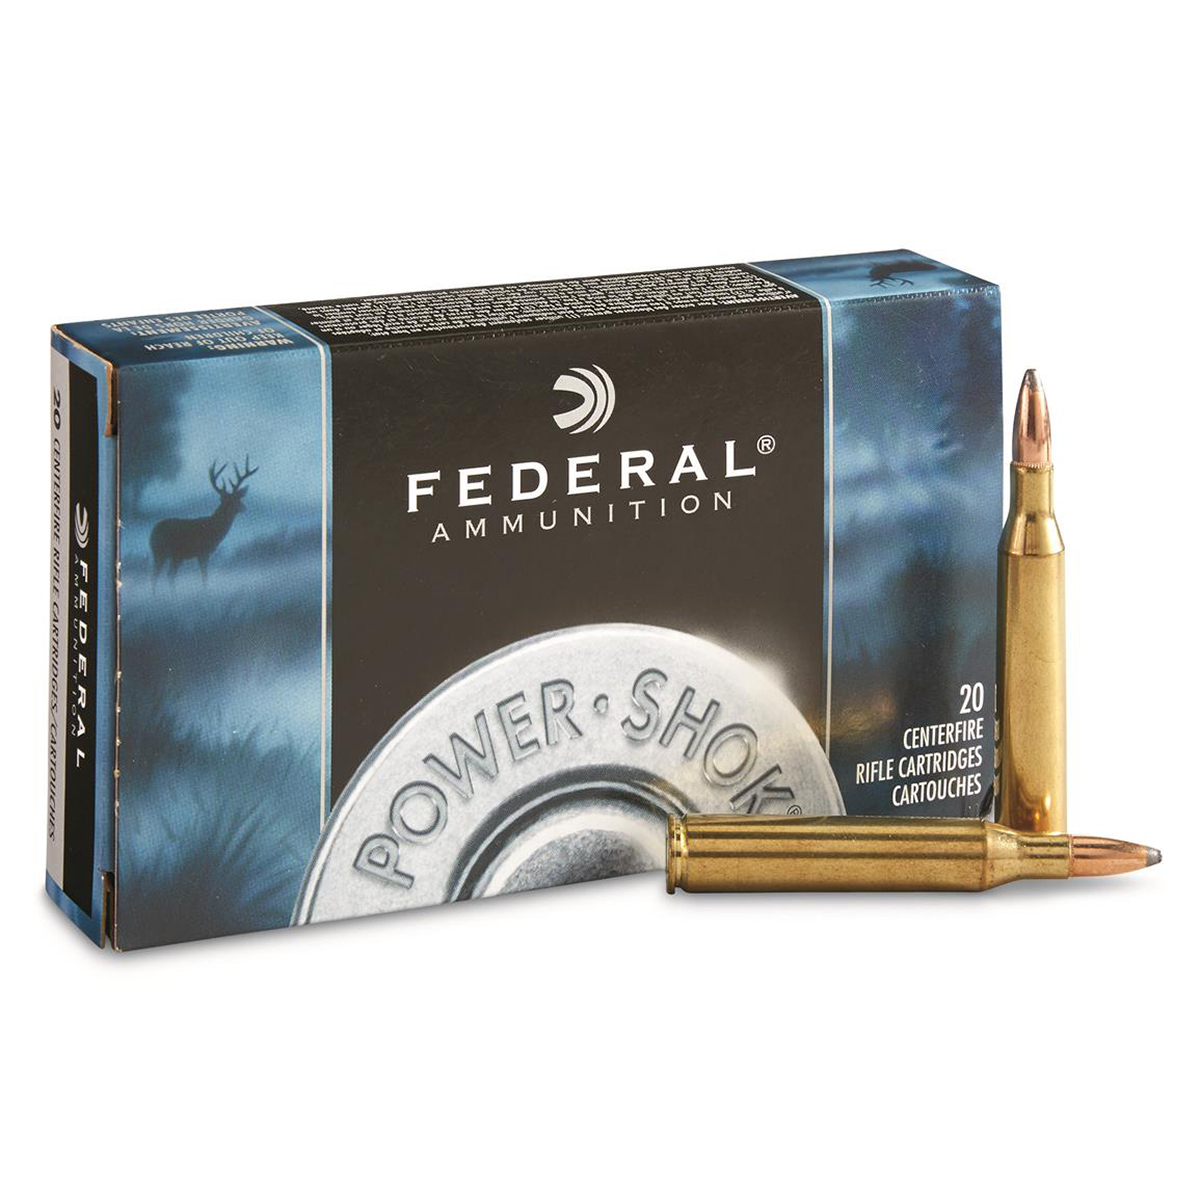 Federal Power-Shok Rifle Ammunition, .270 WSM, 130-gr, JSP